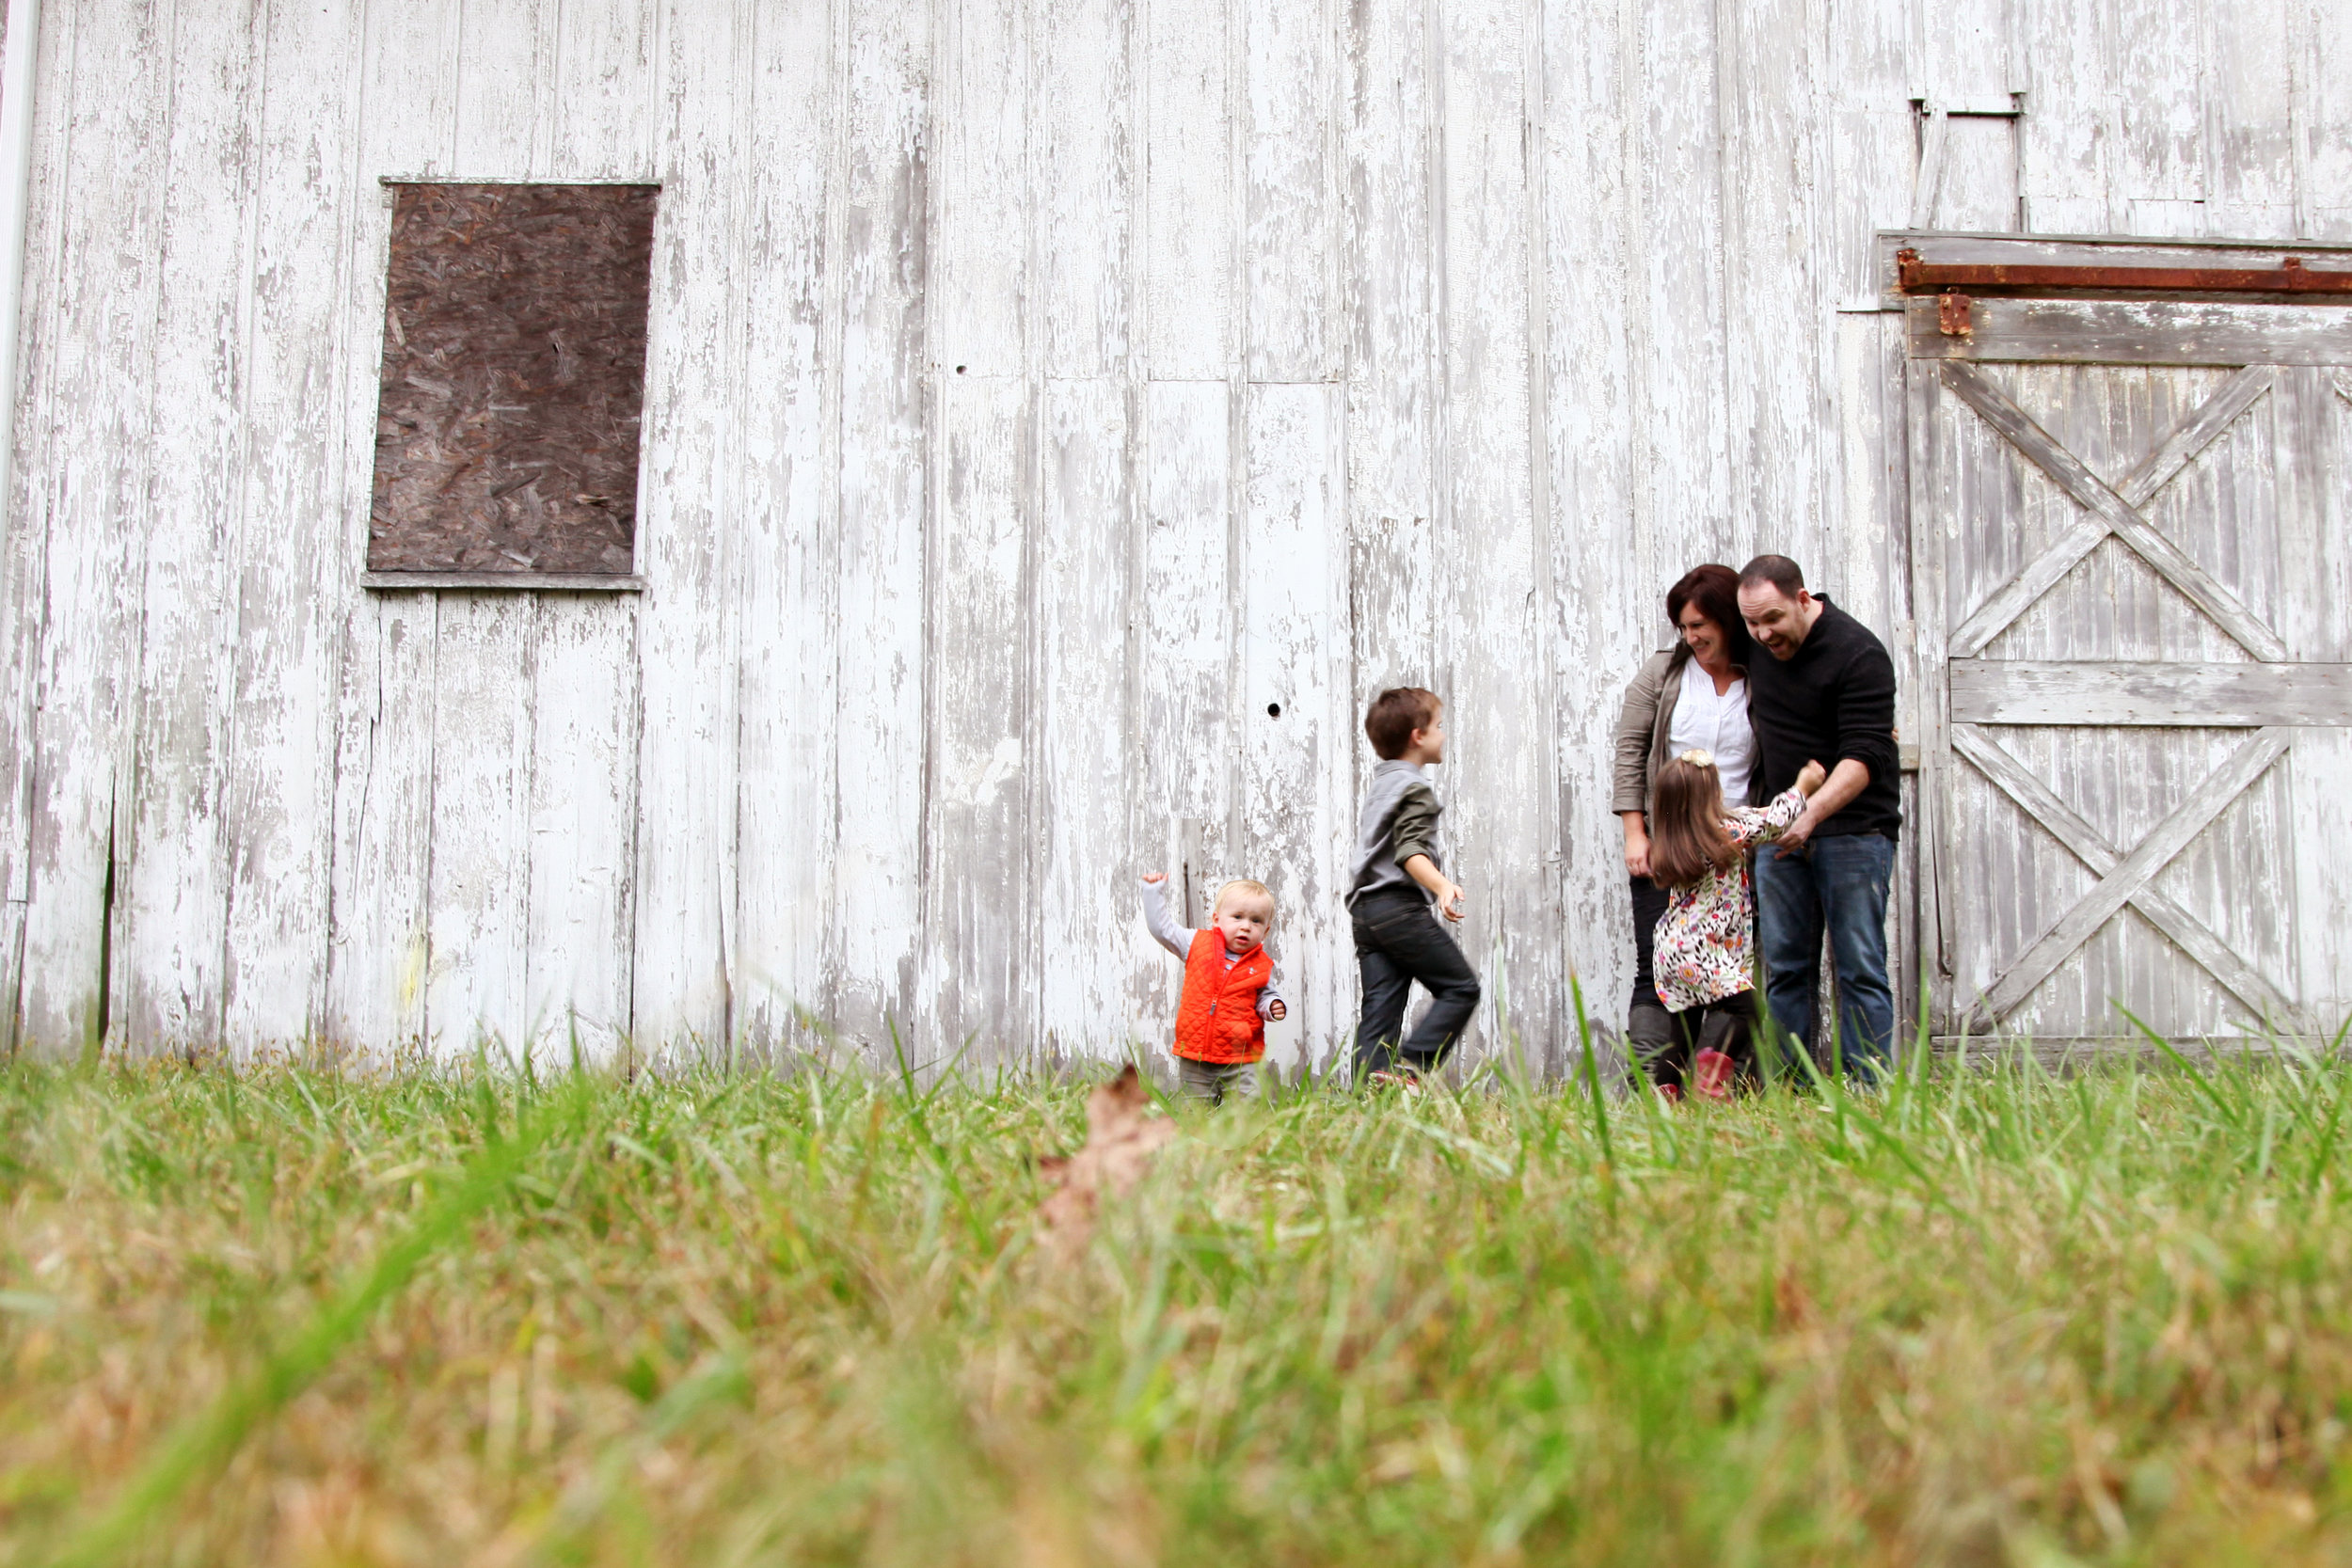 Best Bergen County Family Photographer, Allendale Family Photographer, Nothern New Jersey Family Photographer, New Jersey Family Photographer